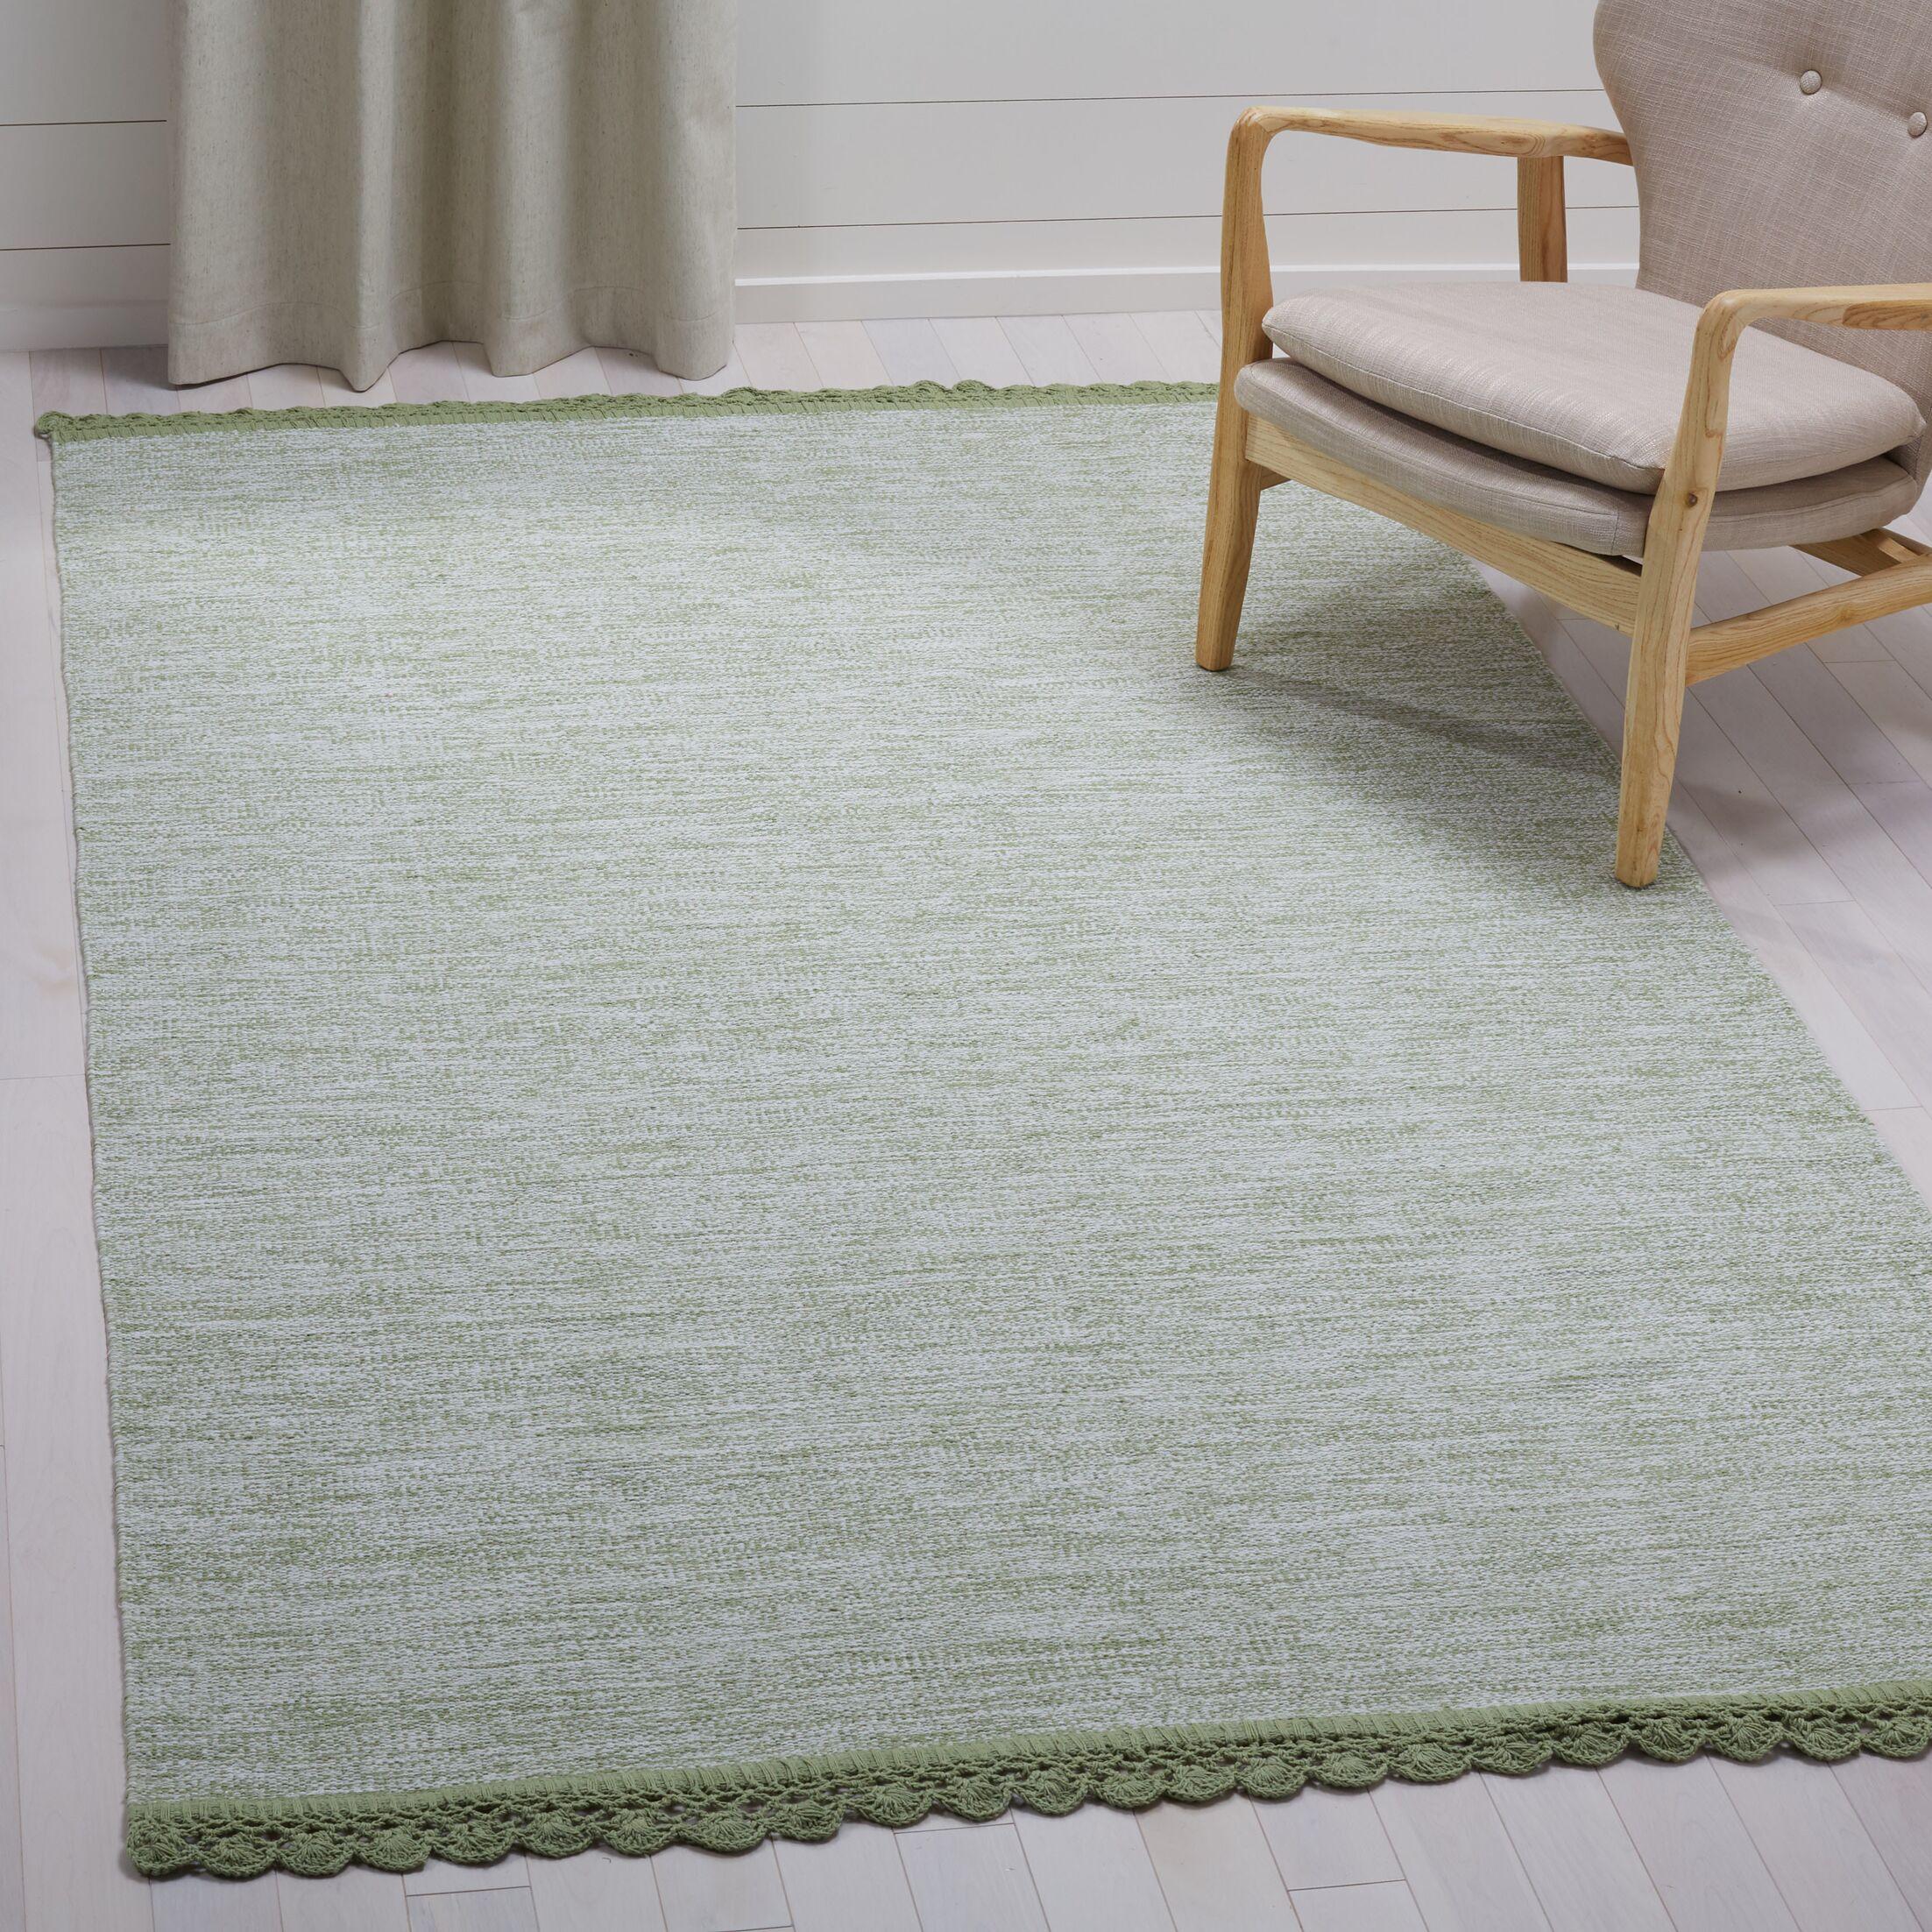 Mohnton Hand-Woven Green/Gray Area Rug Rug Size: Rectangle 5' x 8'